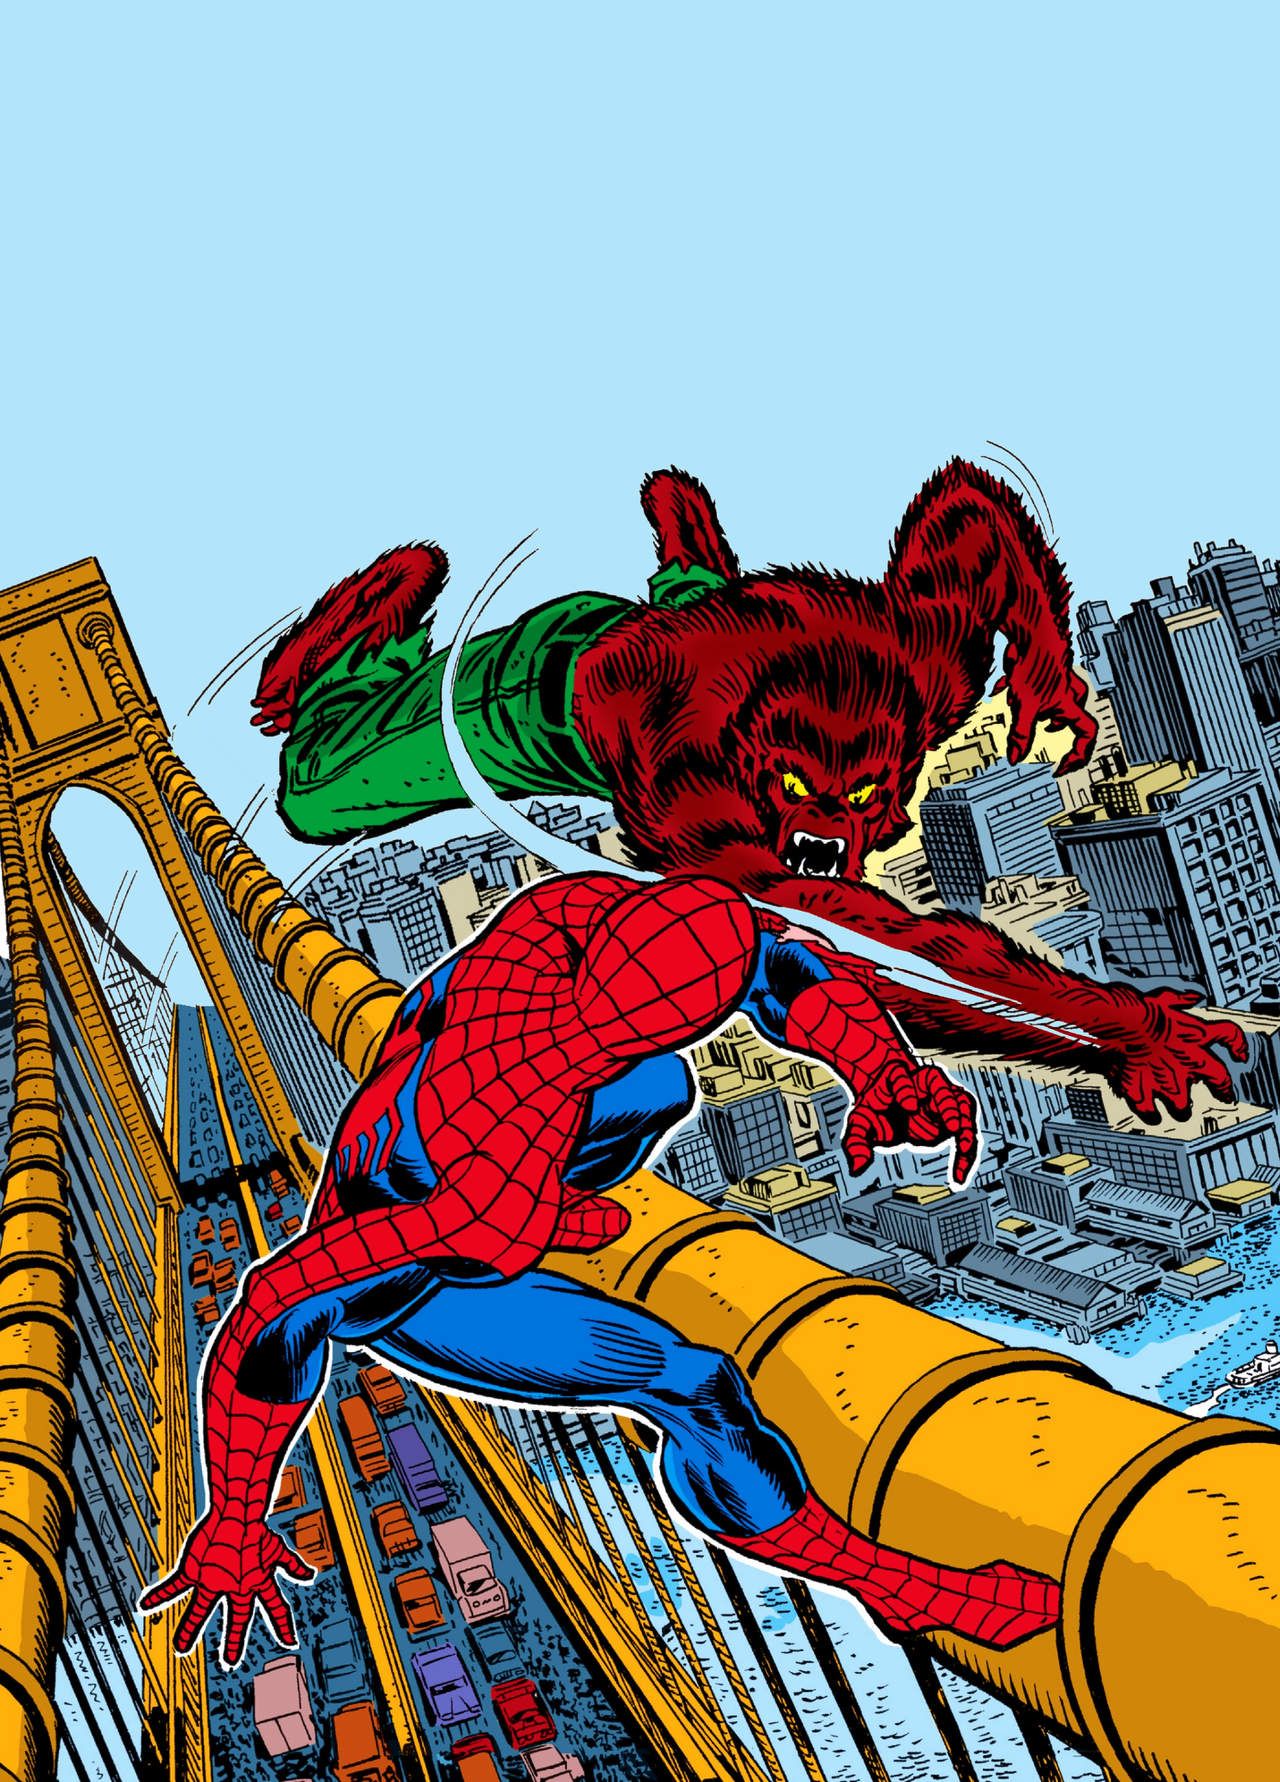 spider man vs werewolf by night art by gil kane spider man vs